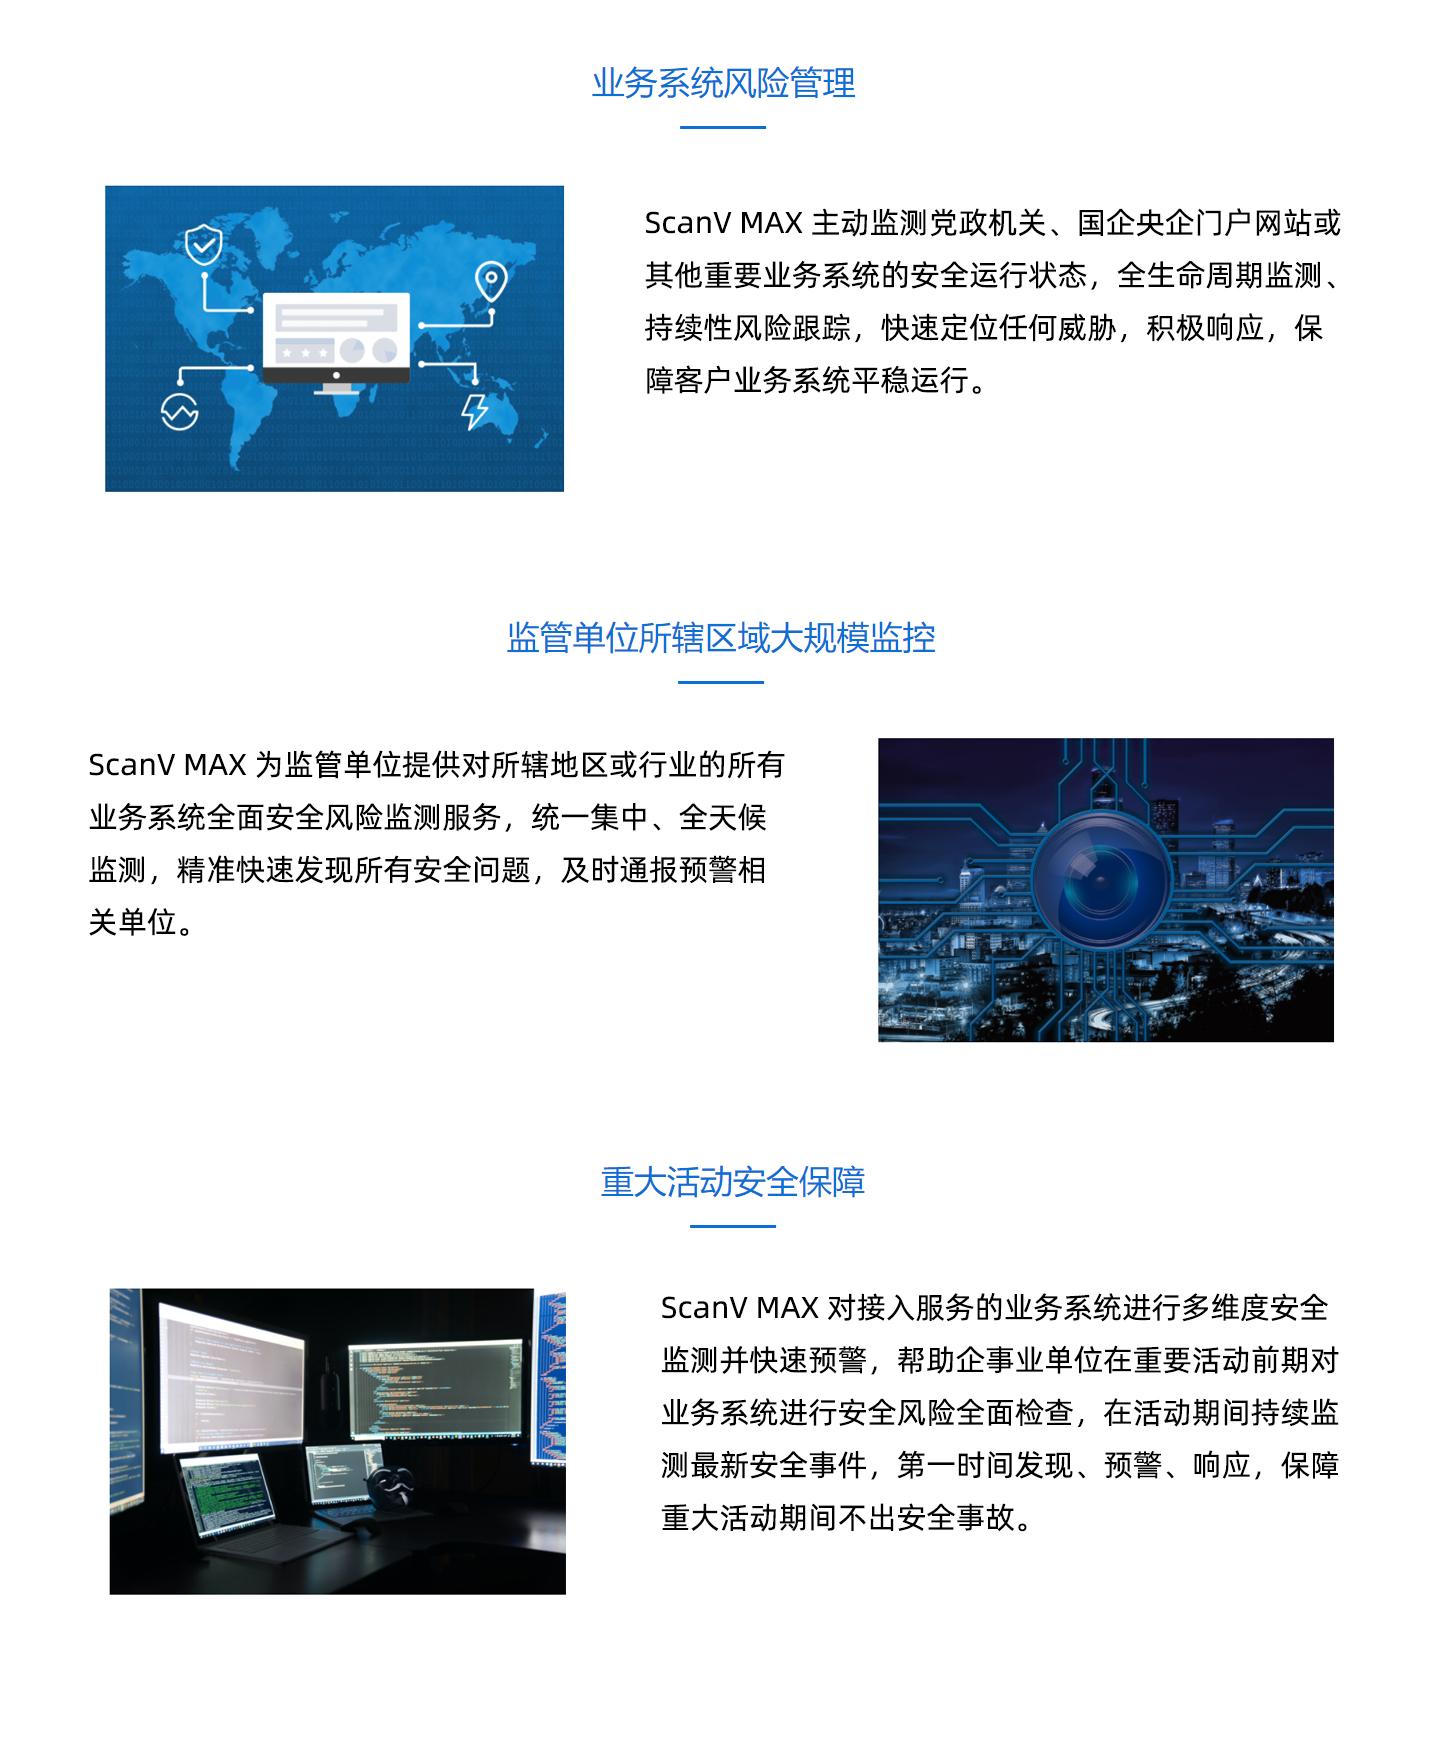 ScanV-MAX-(云监测)1440_03.jpg